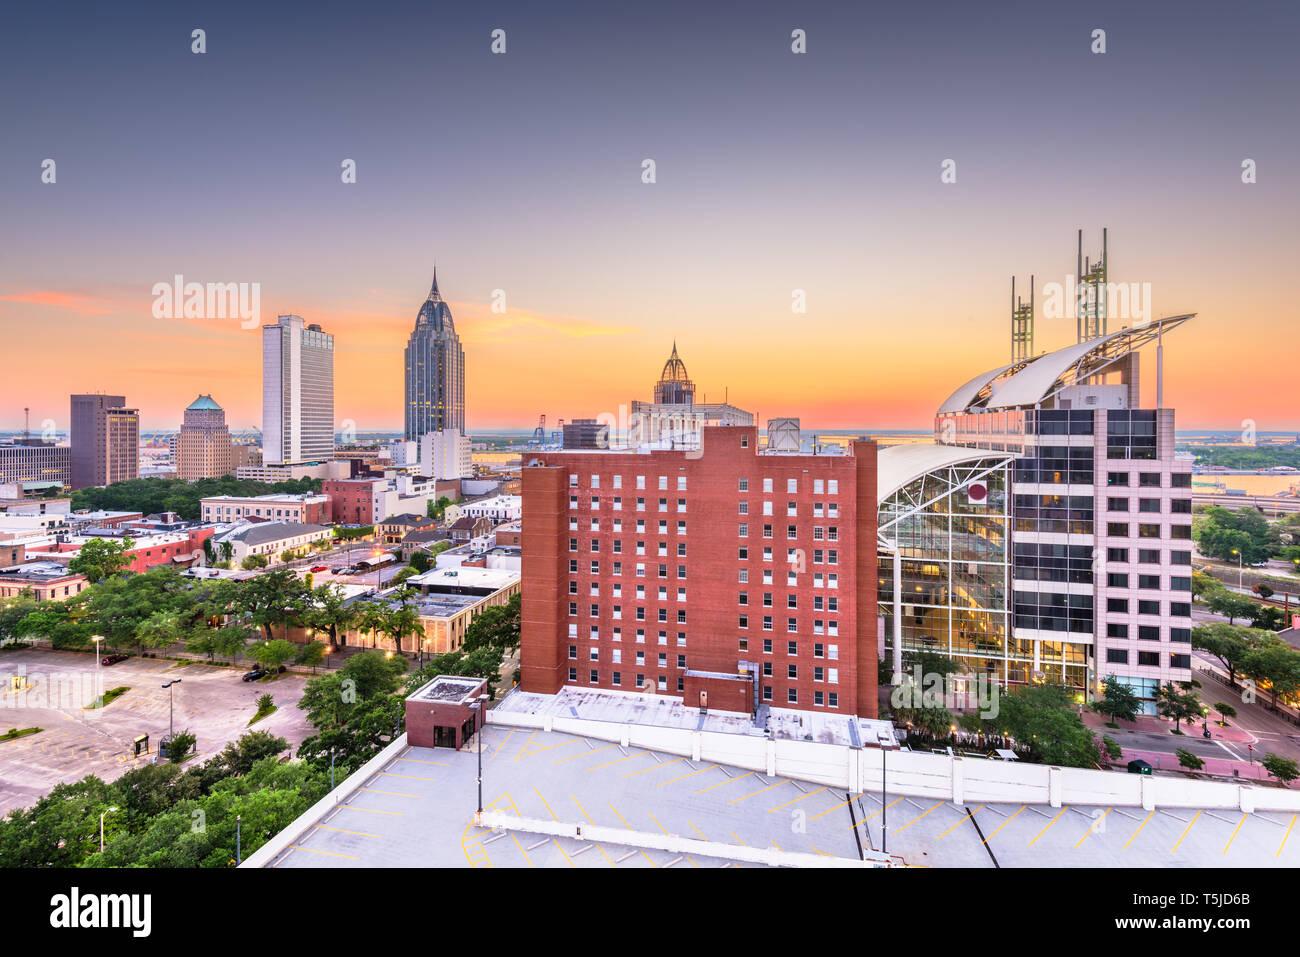 Mobile, Alabama, USA Downtown Skyline in der Dämmerung. Stockfoto